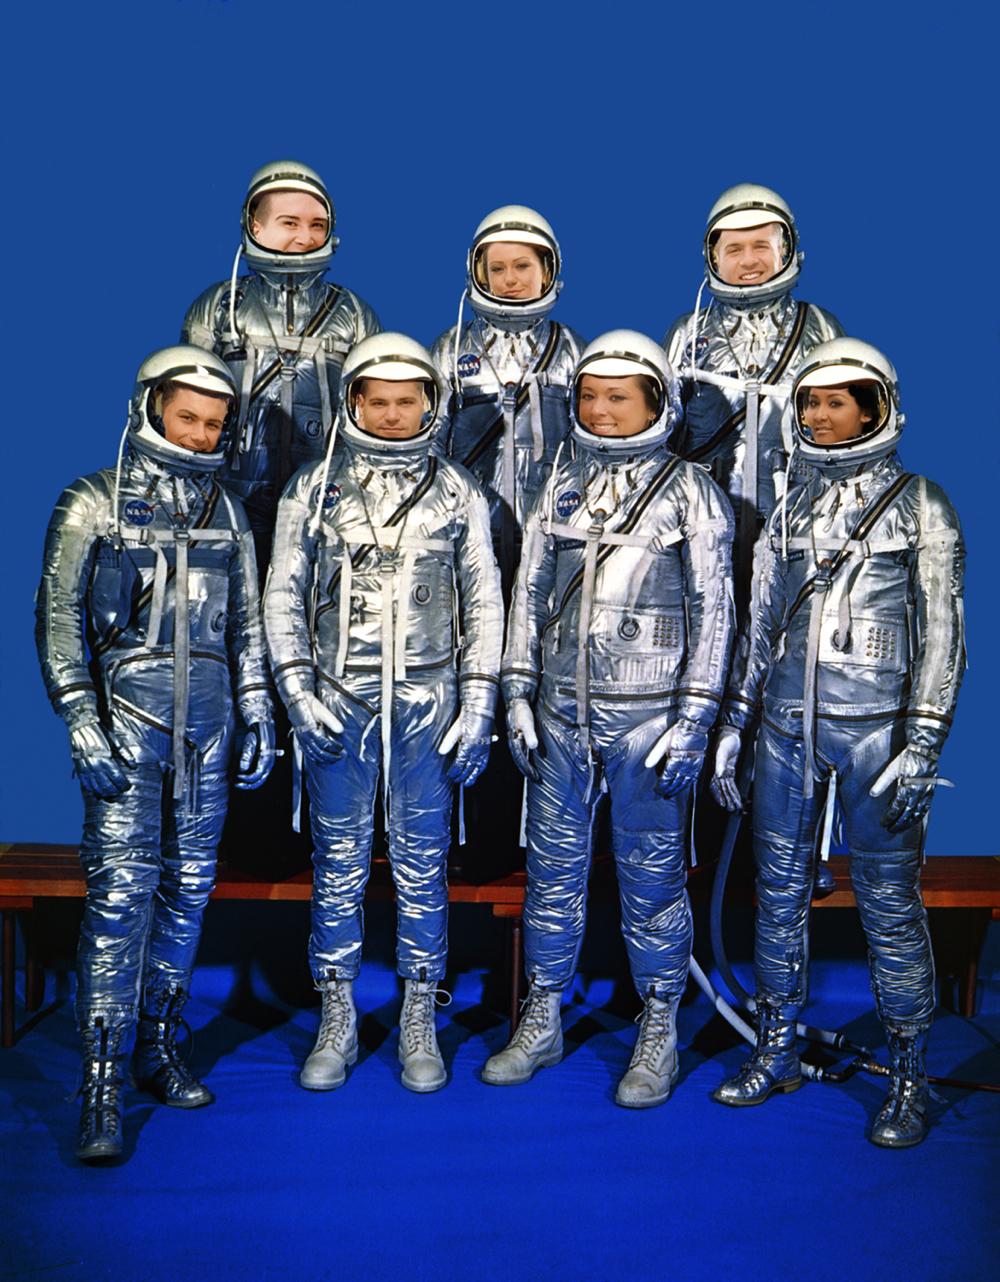 Original_7_Astronauts_in_Spacesuits_-_GPN-2000-001293 copy